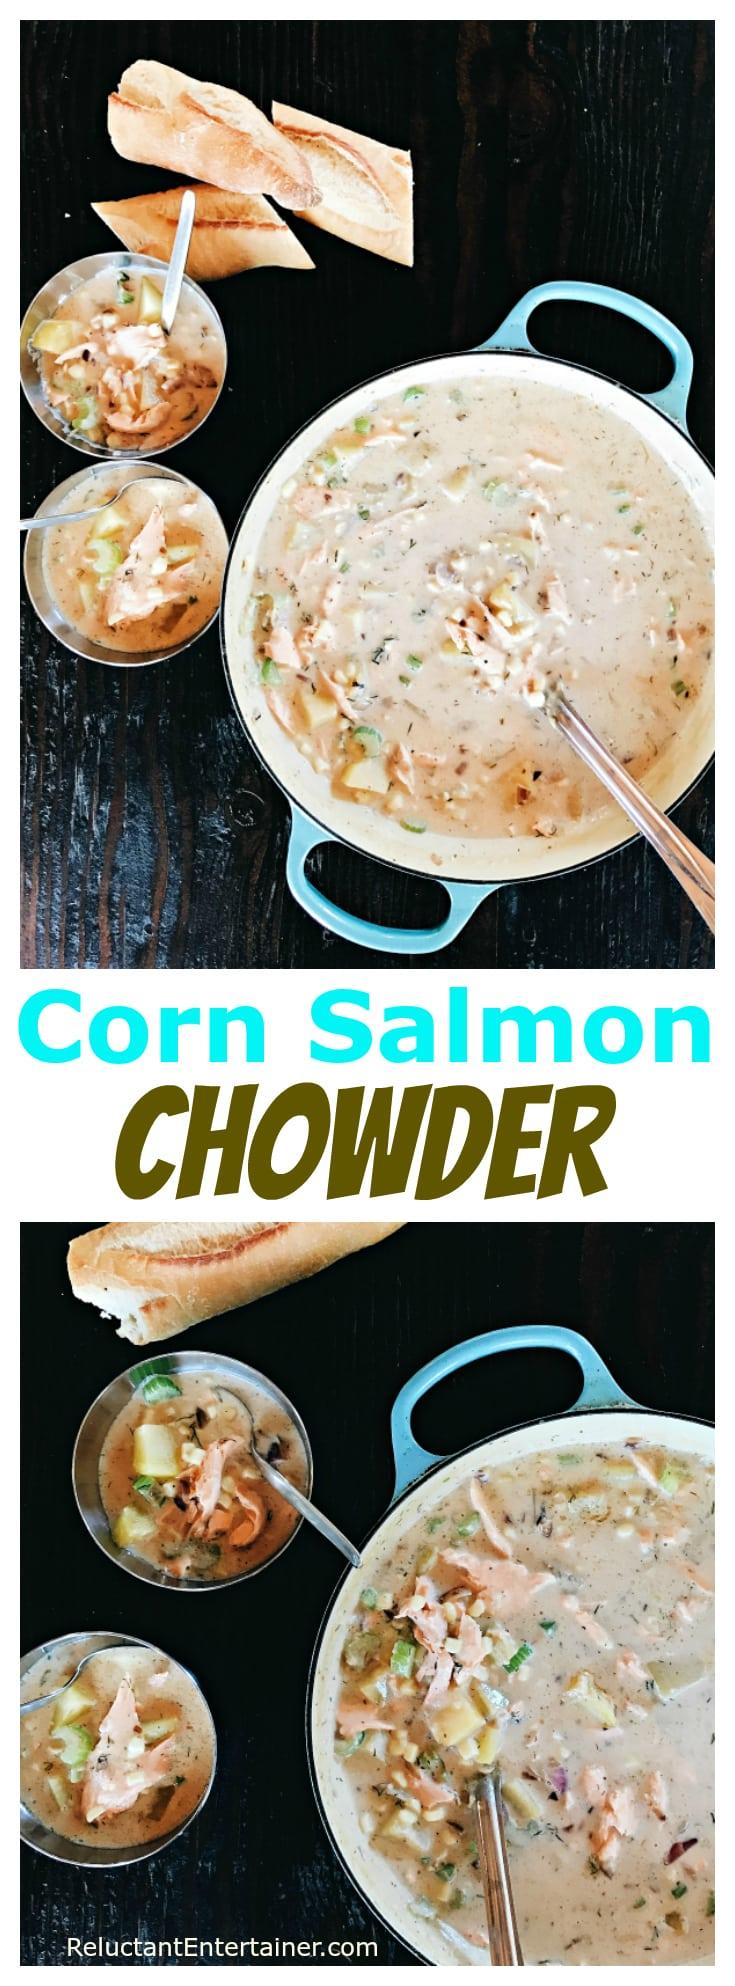 Corn Salmon Chowder Recipe